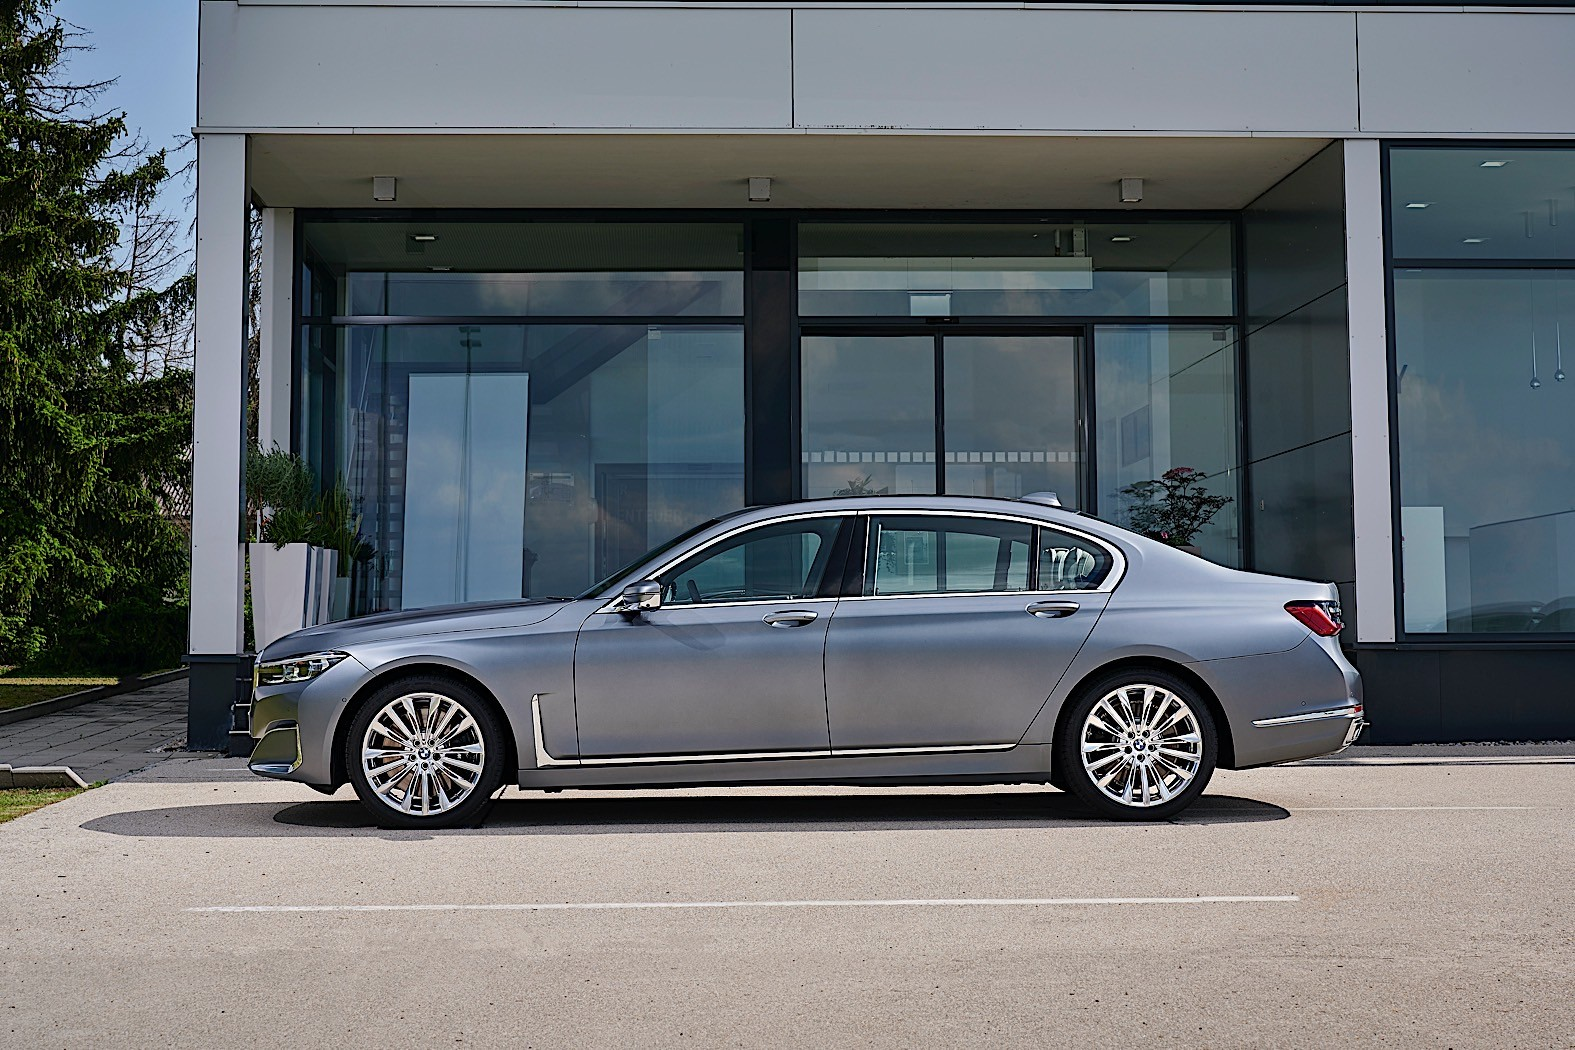 2021 BMW 7 Series Gets New Diesel Options with Mild Hybrid ...